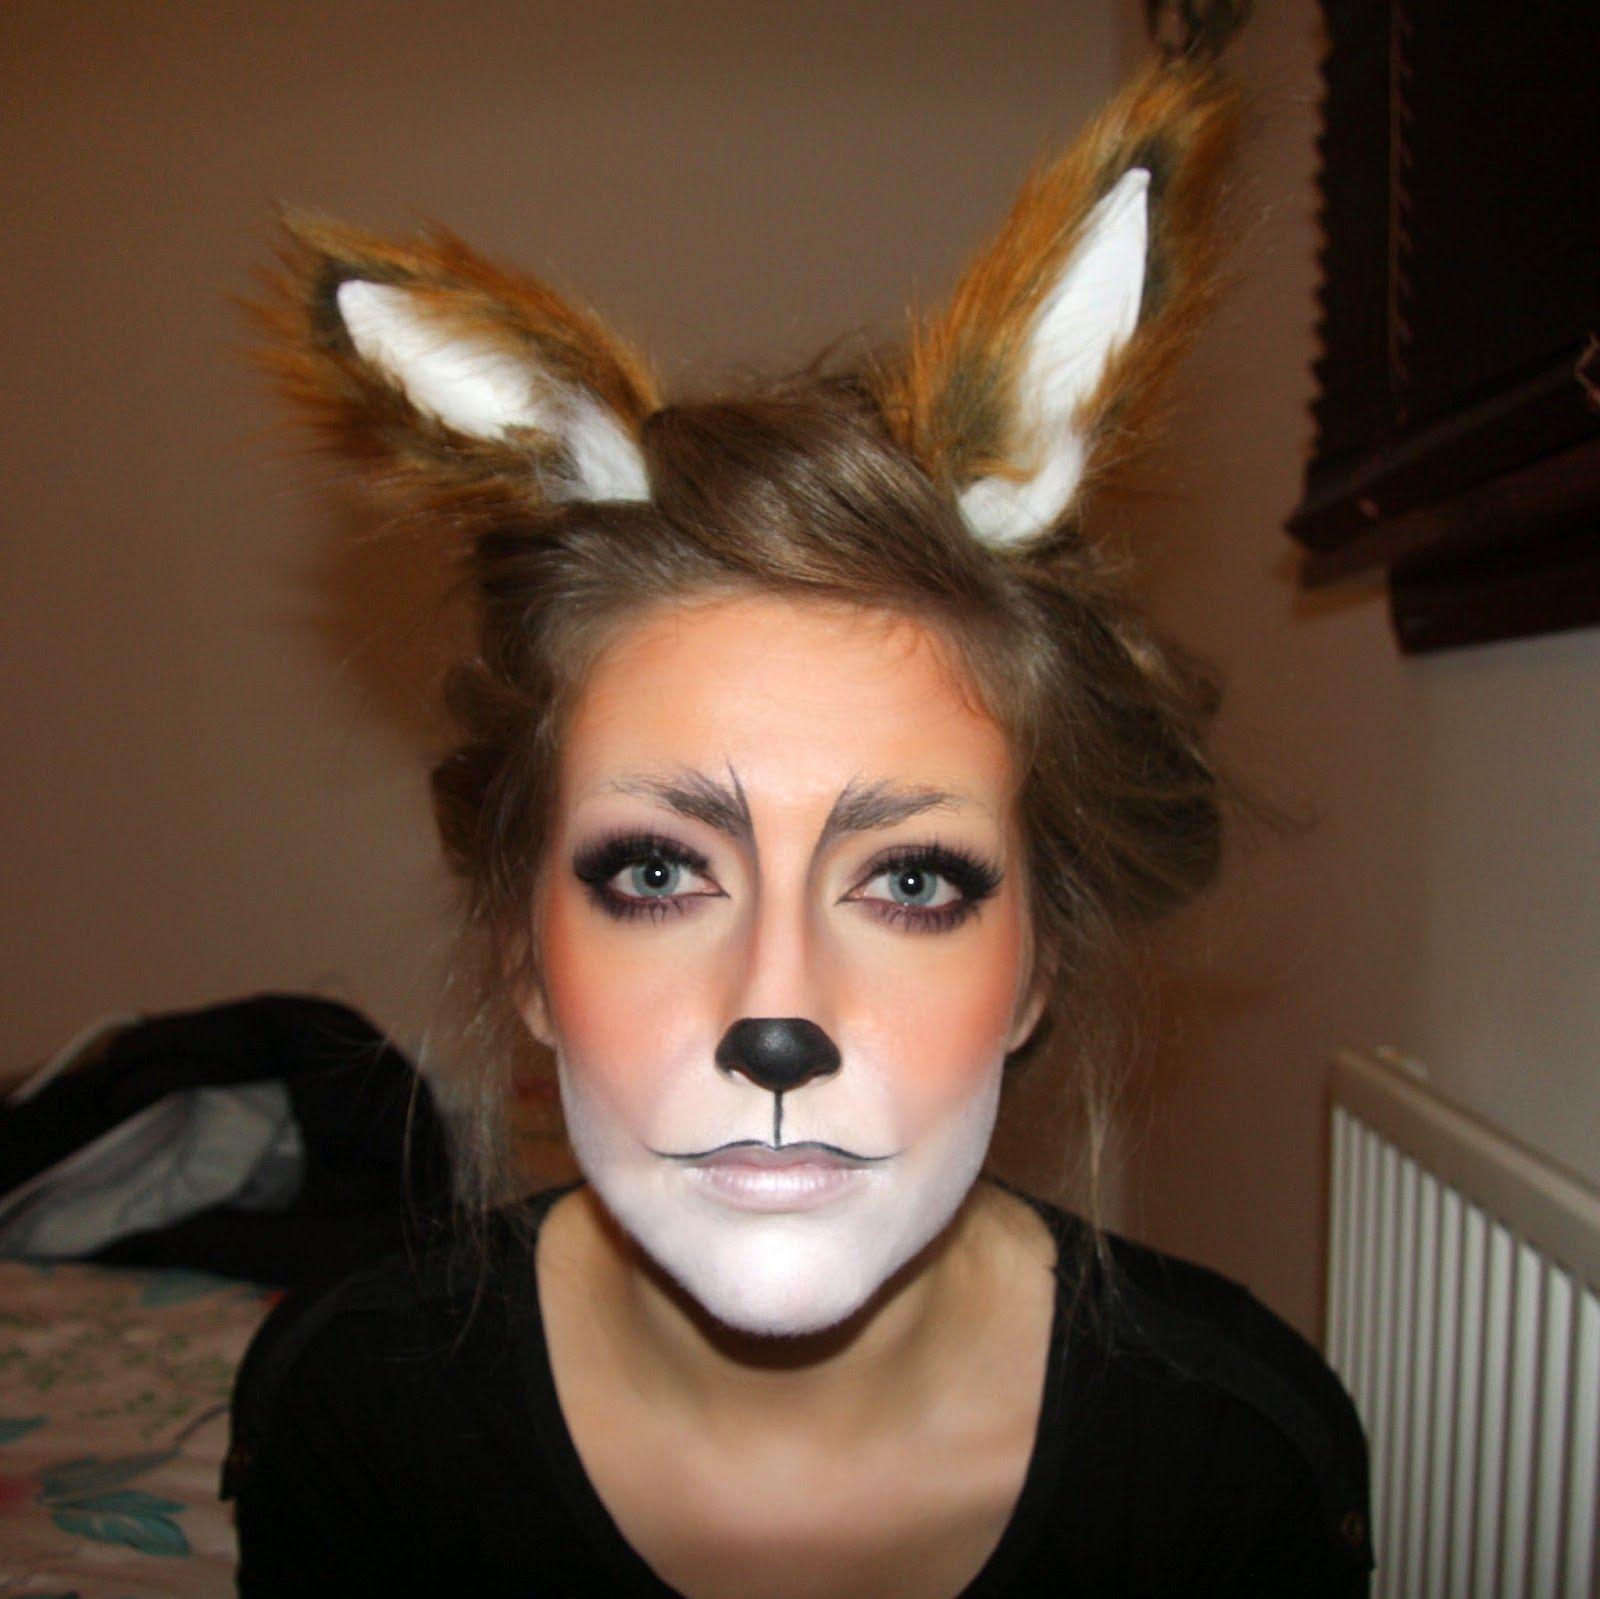 Fox Animal Inspired Makeup Img_5989+edit.jpg DressUp